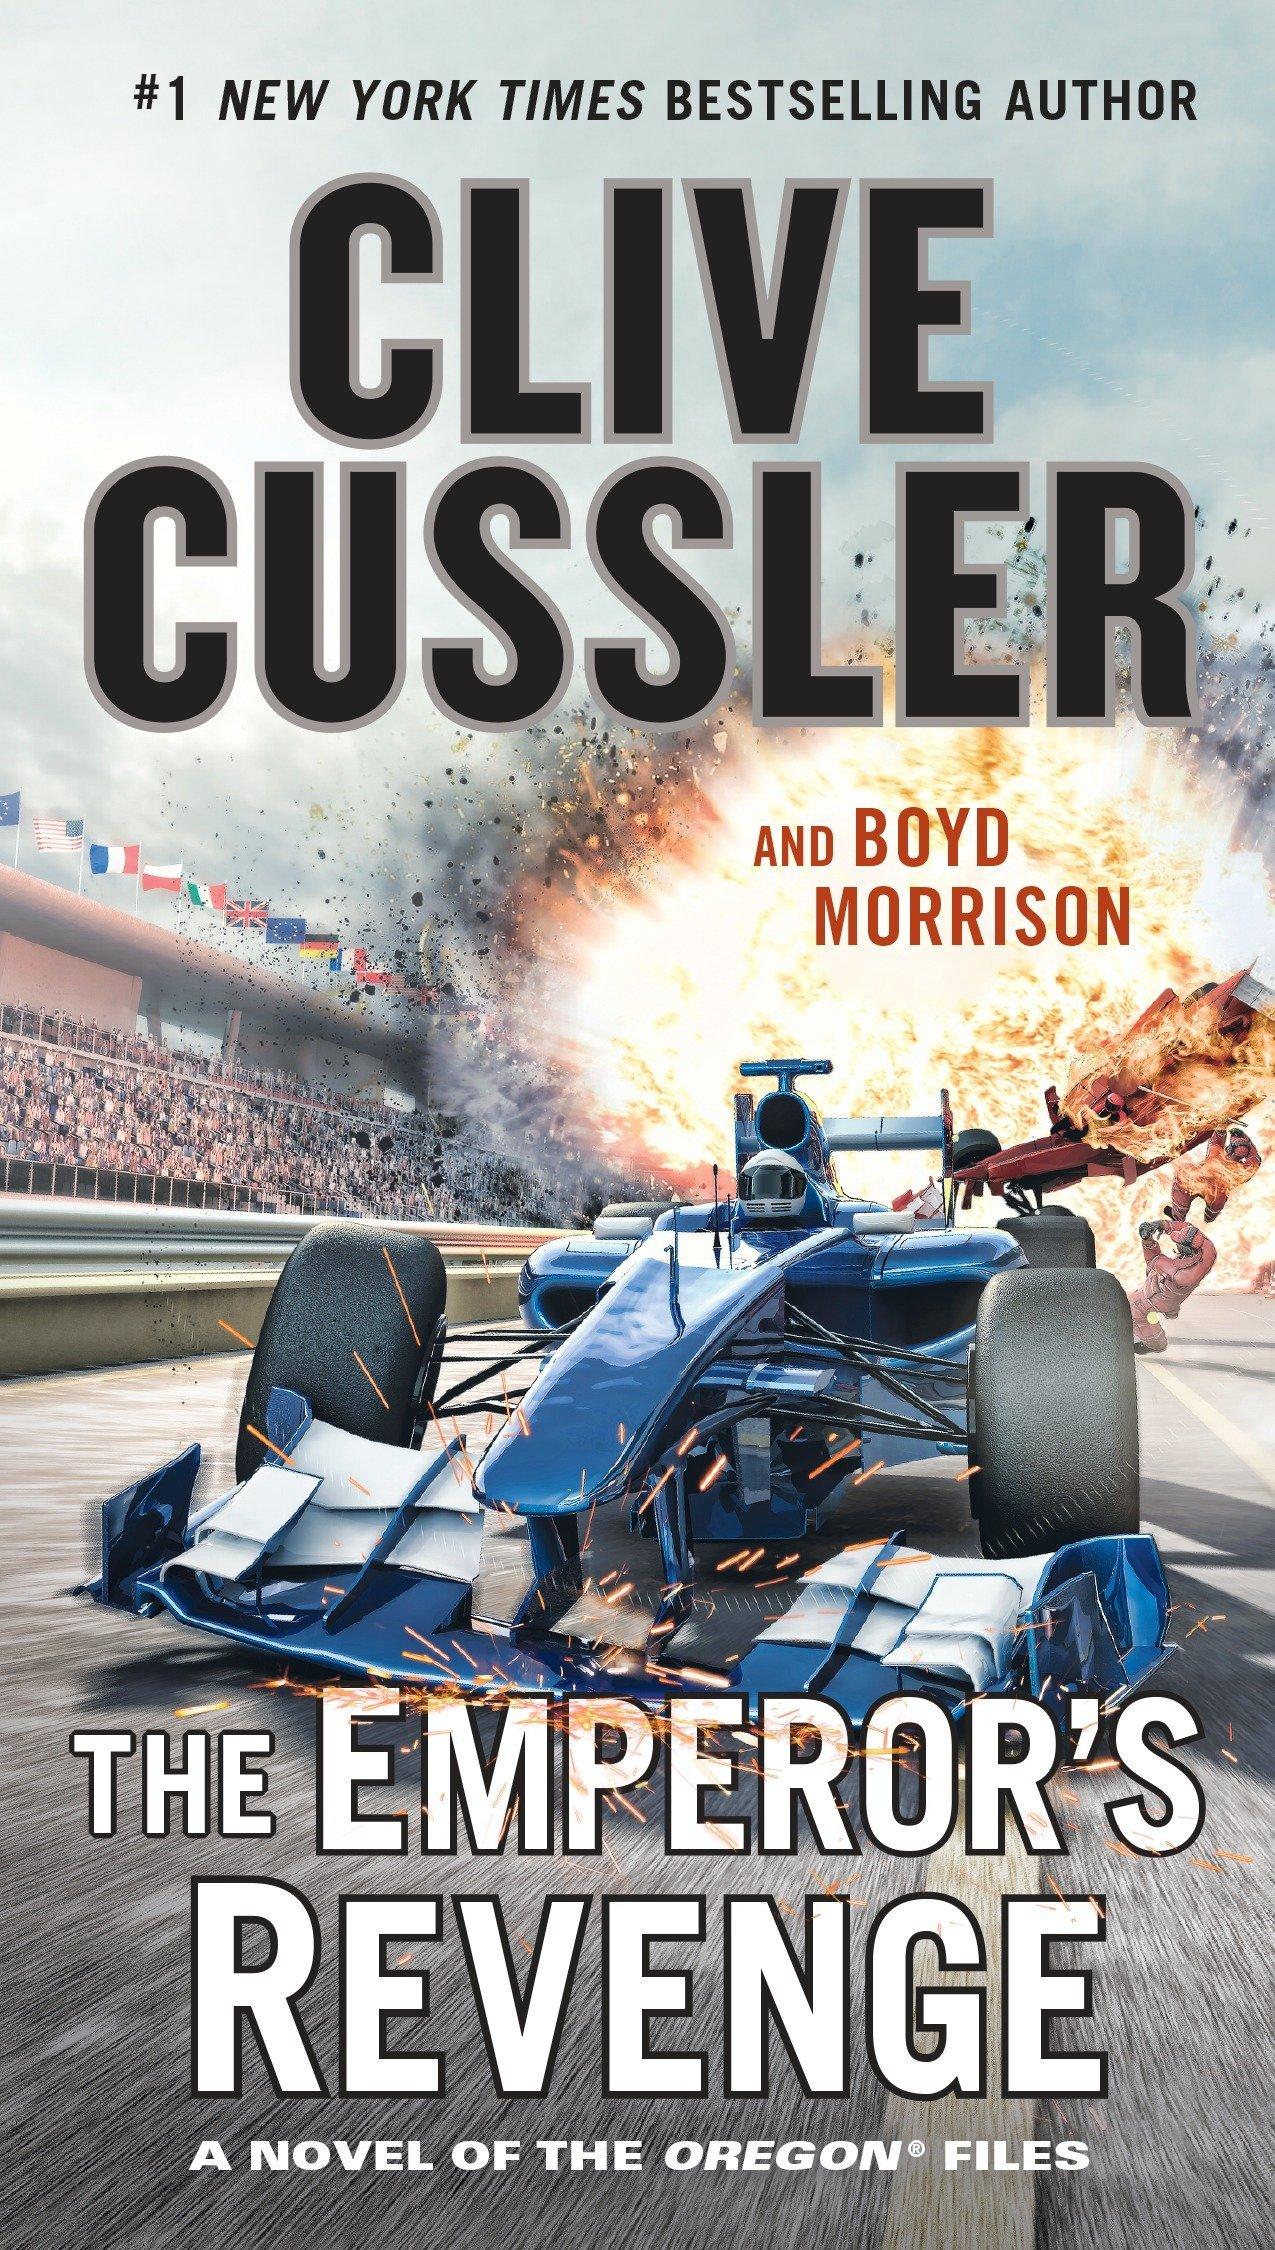 Amazon.com: The Emperor's Revenge (The Oregon Files) (9780735215368): Clive  Cussler, Boyd Morrison: Books